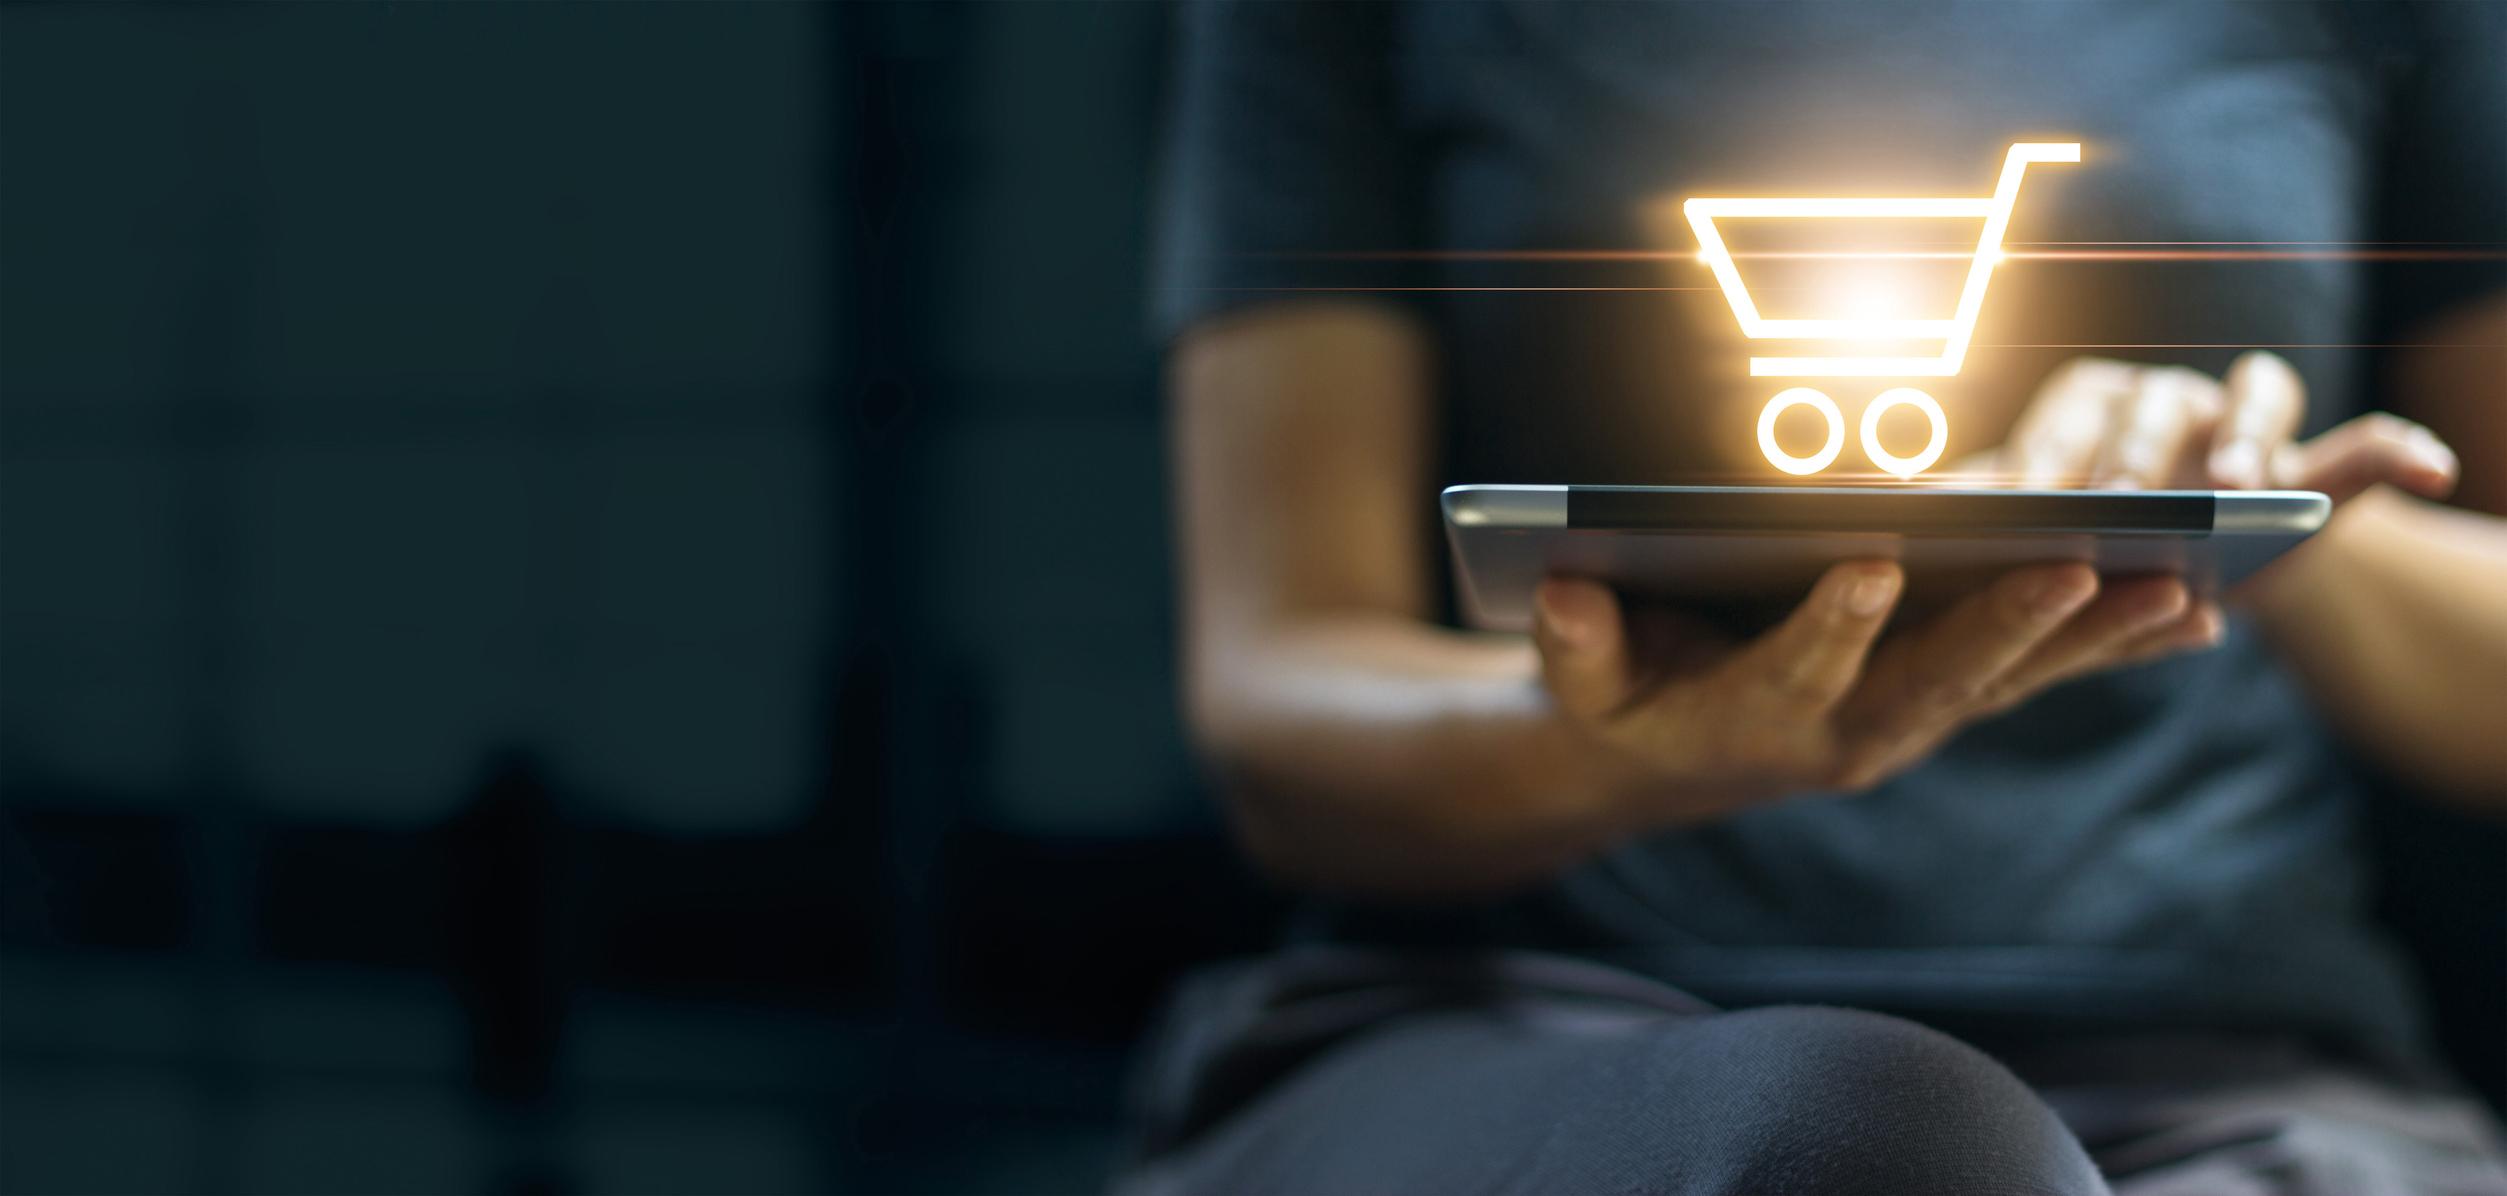 neon-shopping-cart-digital-readiness